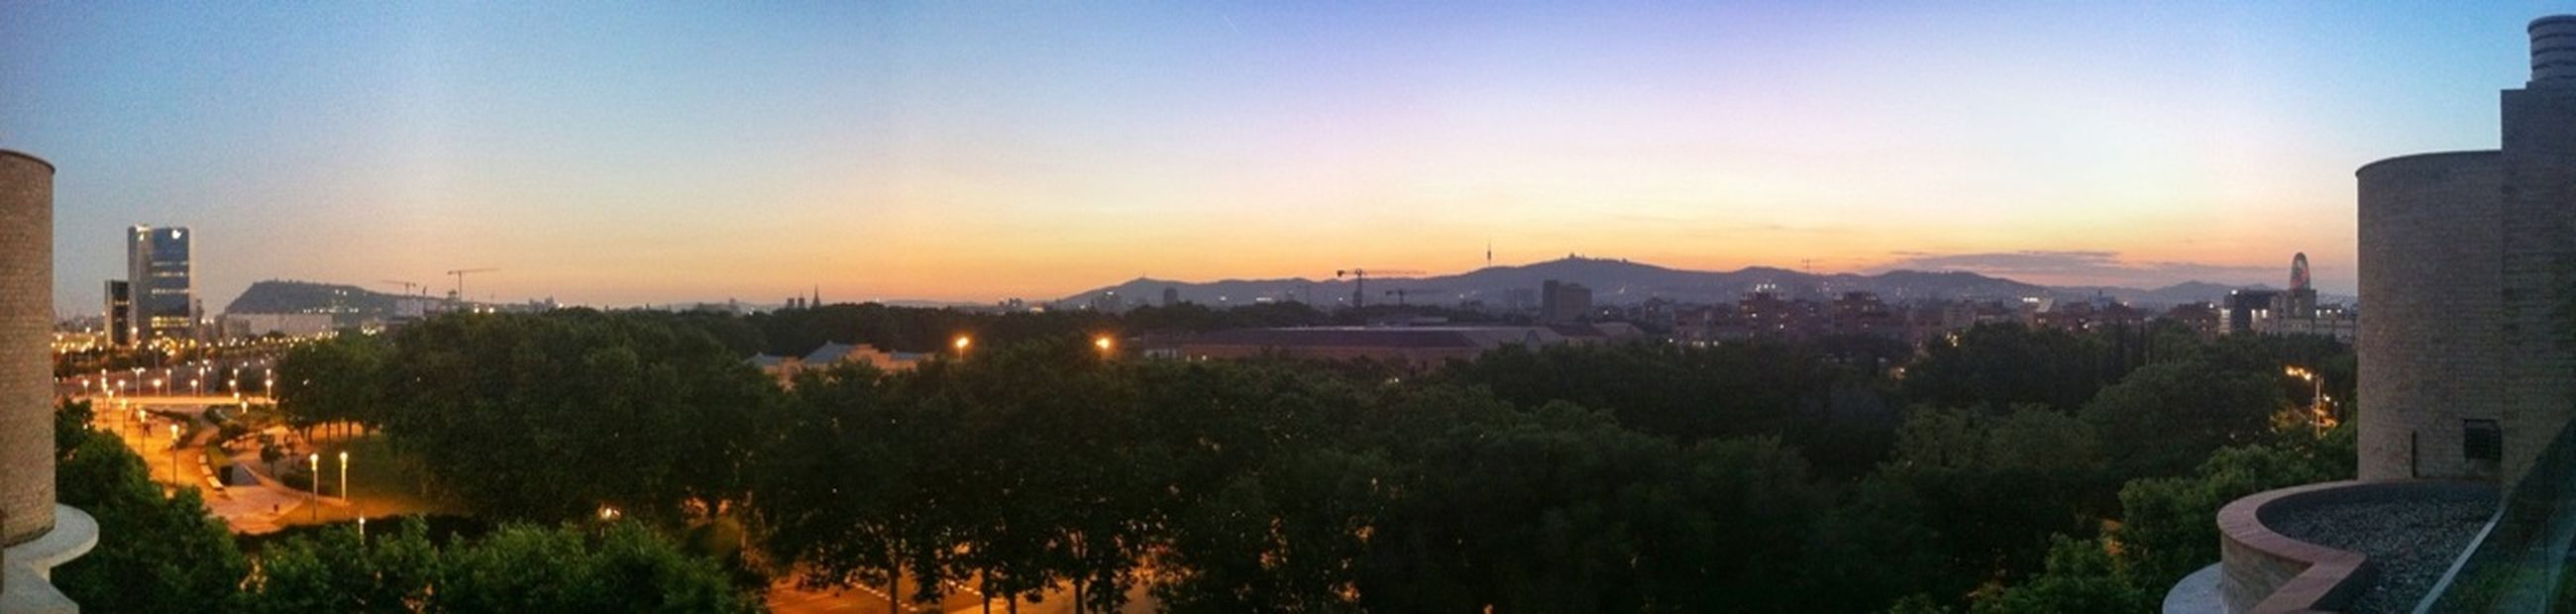 Skyline Barcelona Girls' Time Turn Your Lights Down Low